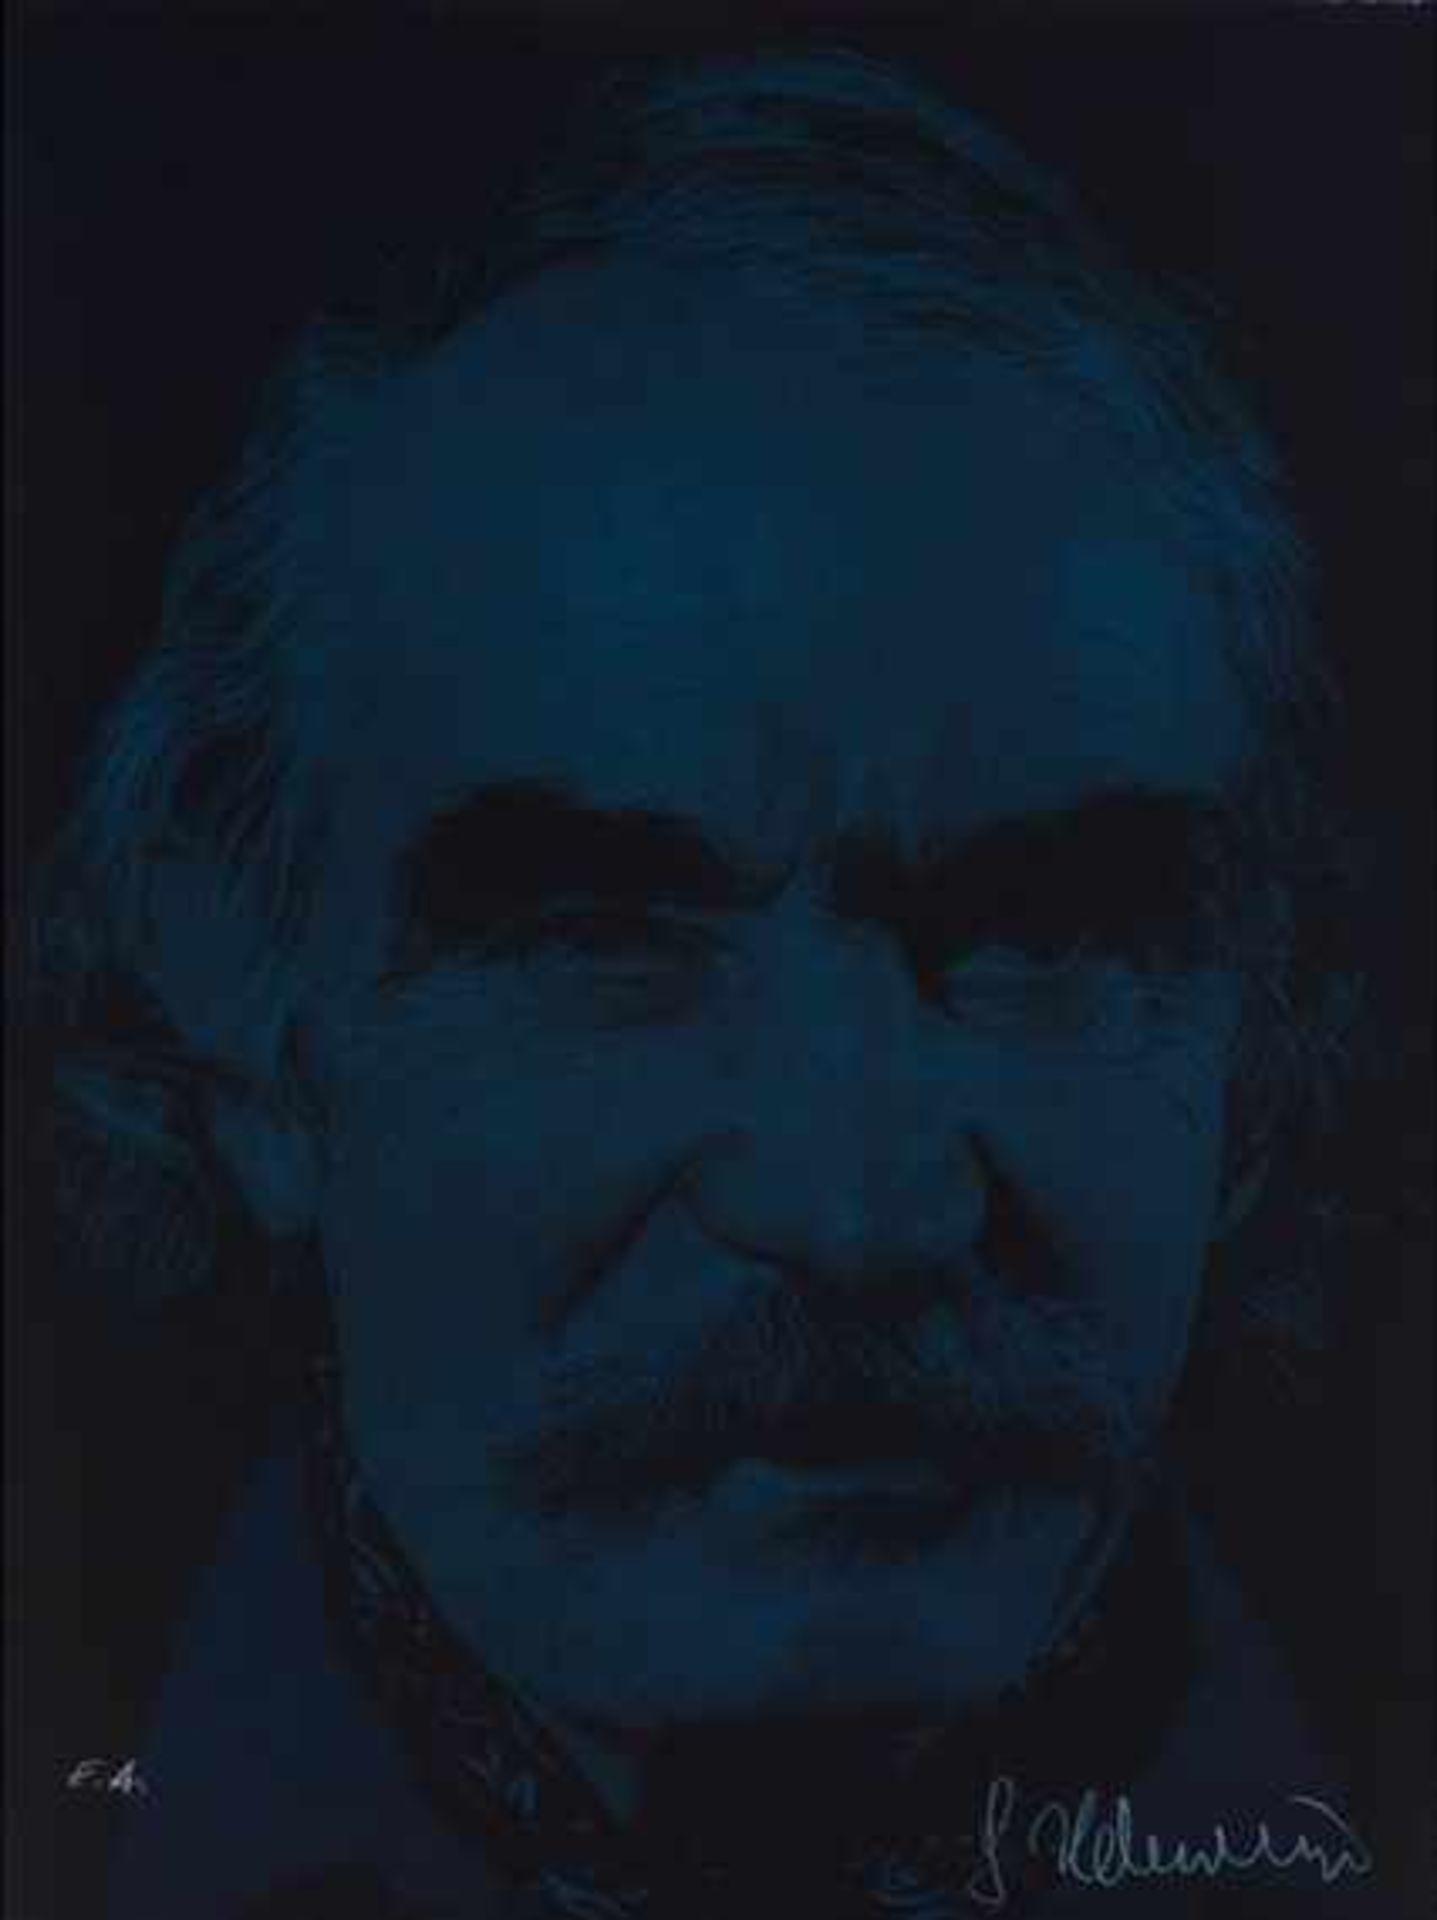 Gottfried Helnwein geb. 1948 Jean Tinguely dunkel Farblithographie handsigniert, nummeriert E.A.